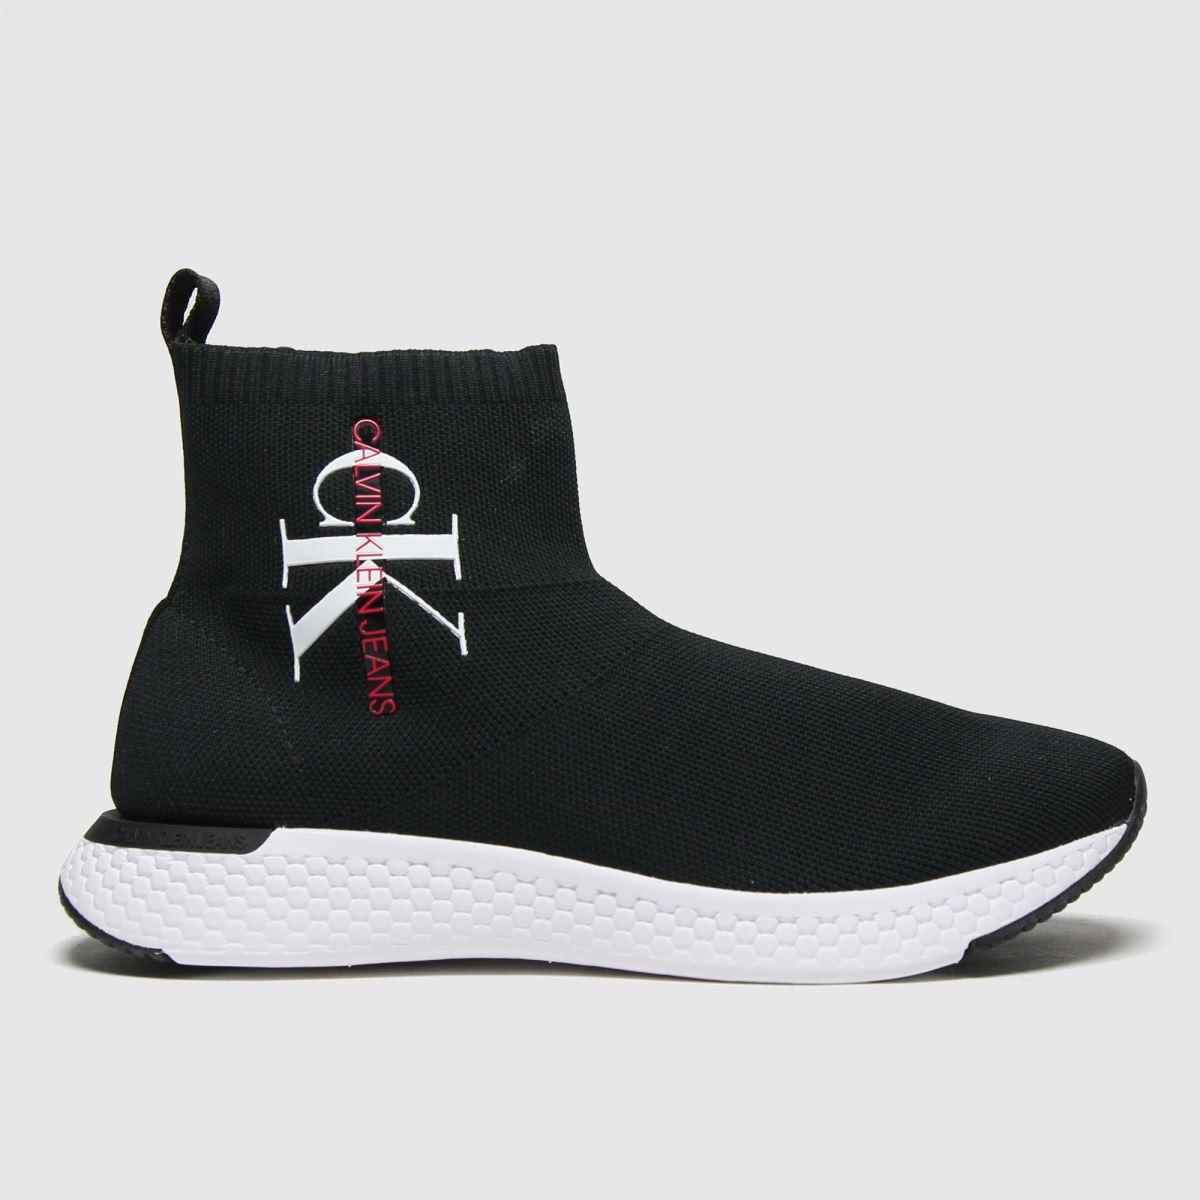 CALVIN KLEIN Black & White J Adalea Boots